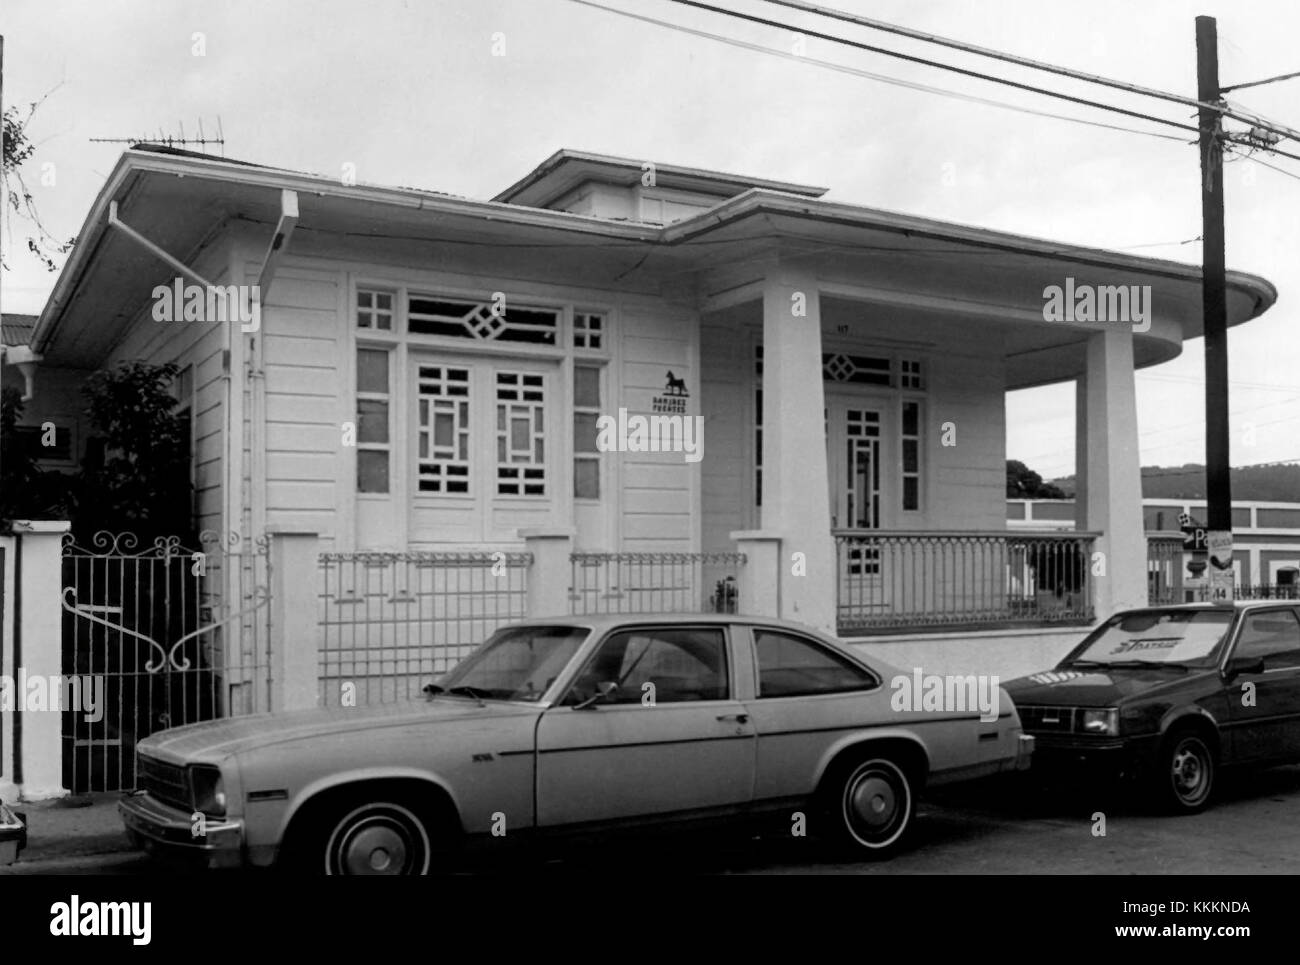 Residencia Ramirez Fuentes 3 - Mayaguez Puerto Rico - Stock Image